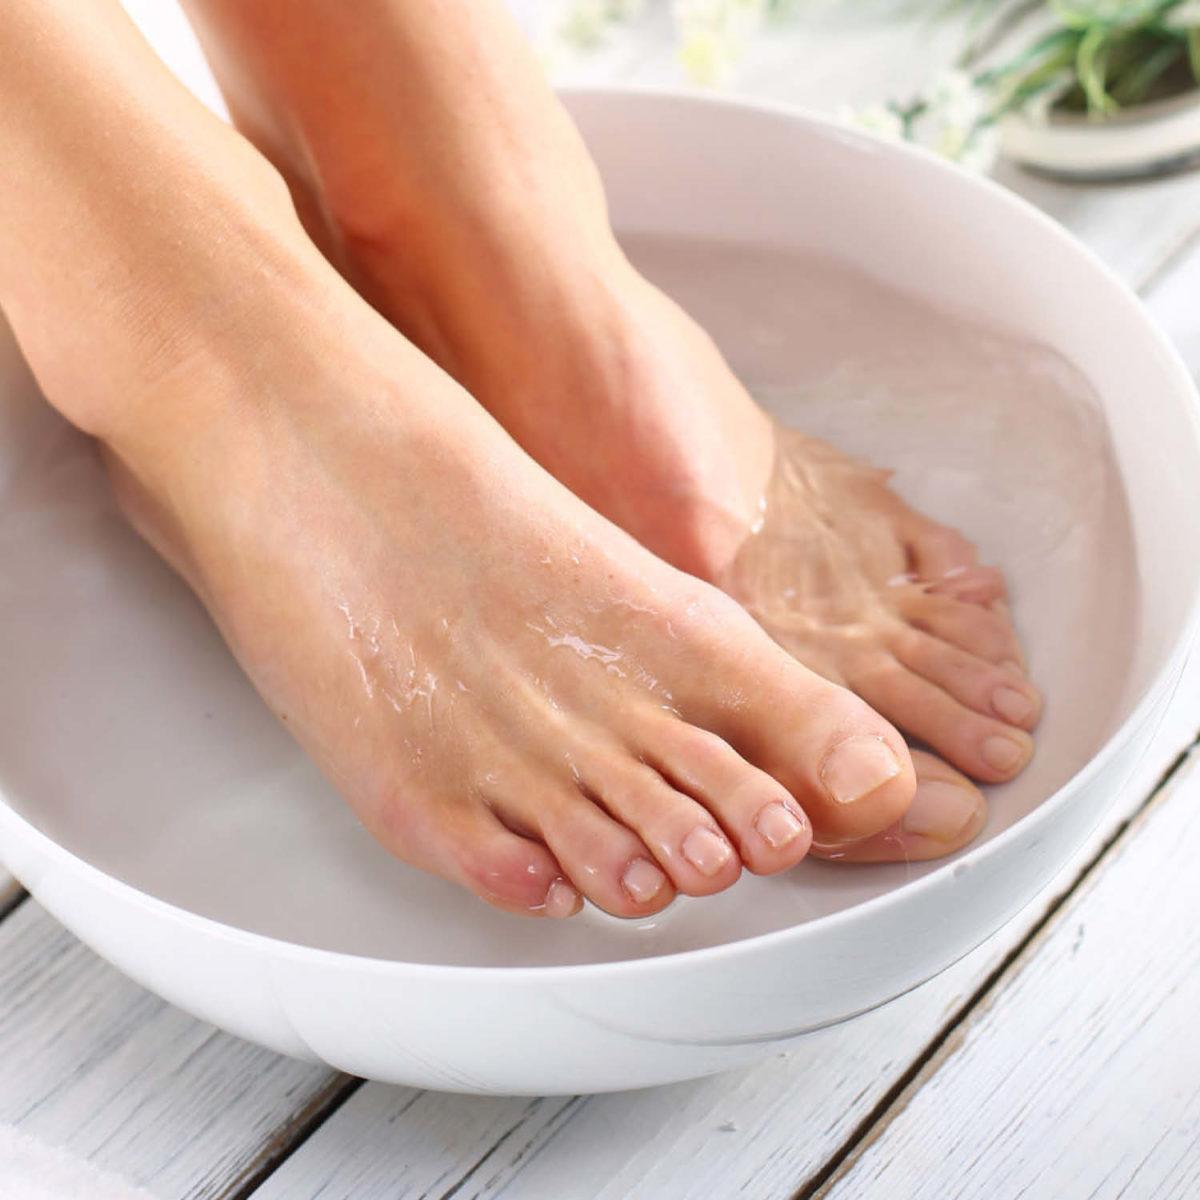 Casida Foot Bath Concentrate Repair & Protect 5 ml 10086741 PZN Apotheke Nagelpilz Fußpilz8